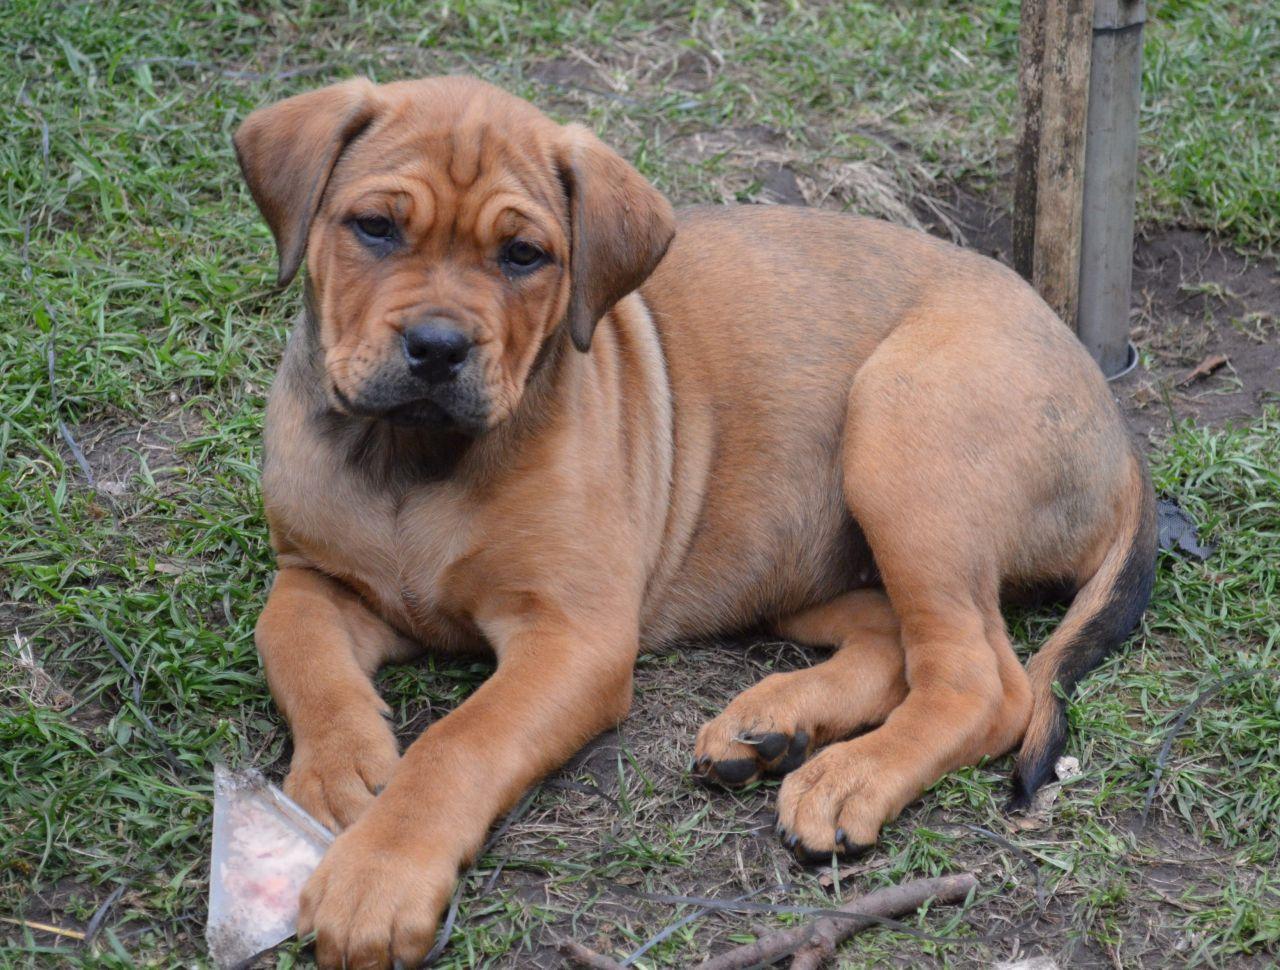 Dogue de Bordeaux Puppies: Dogue Rottweiler X Dogue De Bordeaux Puppies Wirral Breed